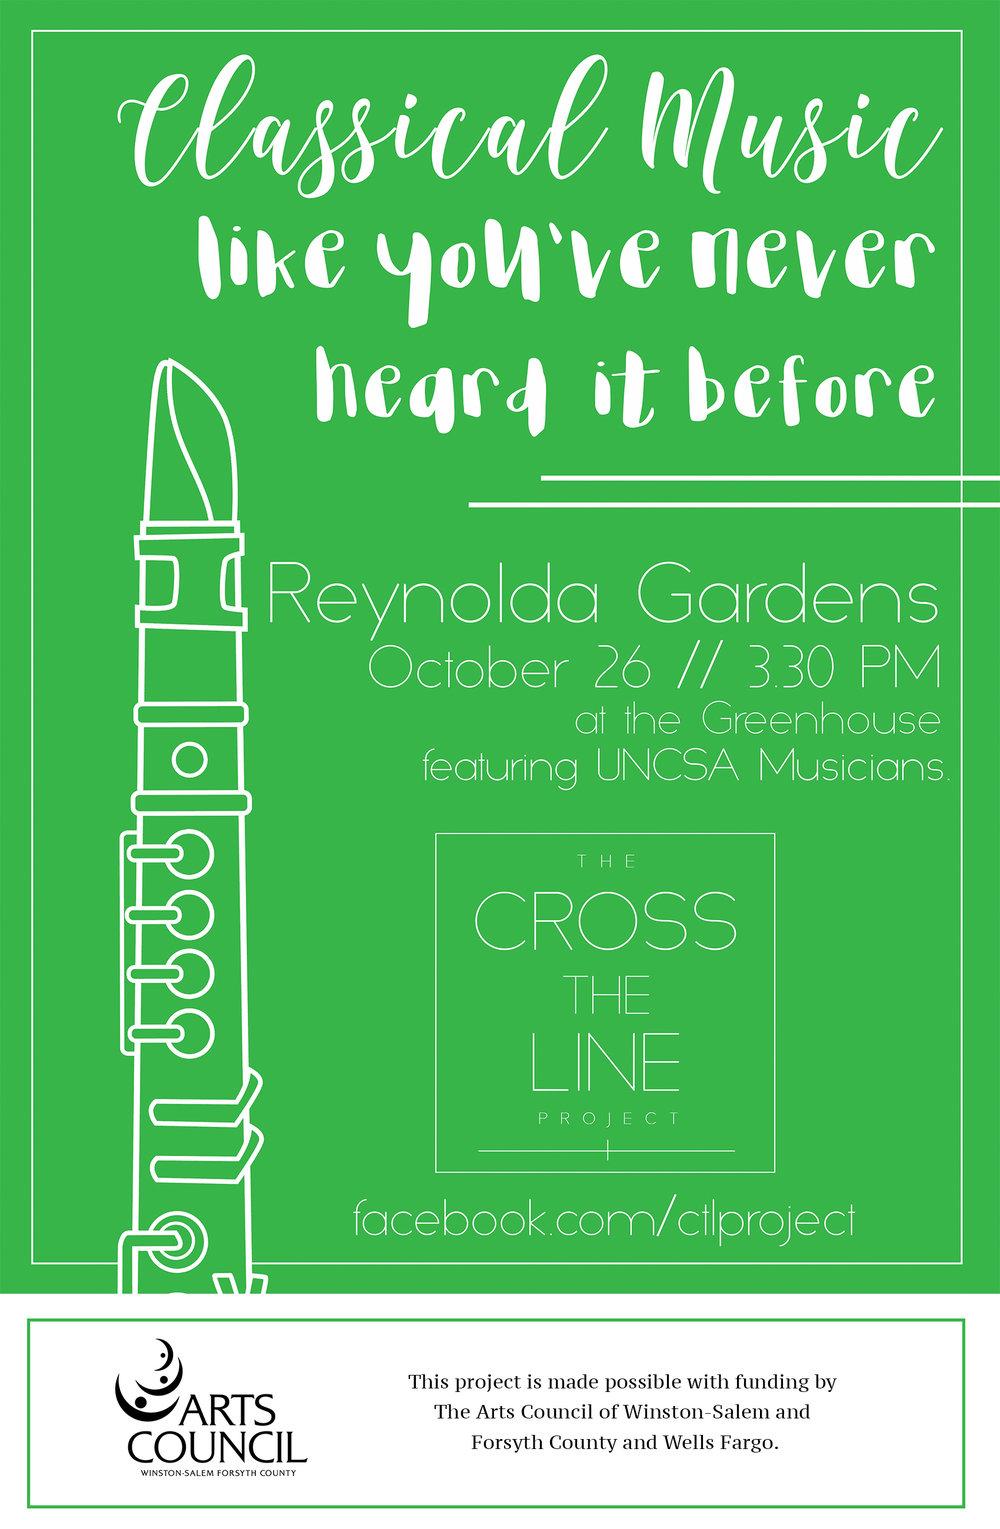 Reynolda Gardens Arts Council.jpg